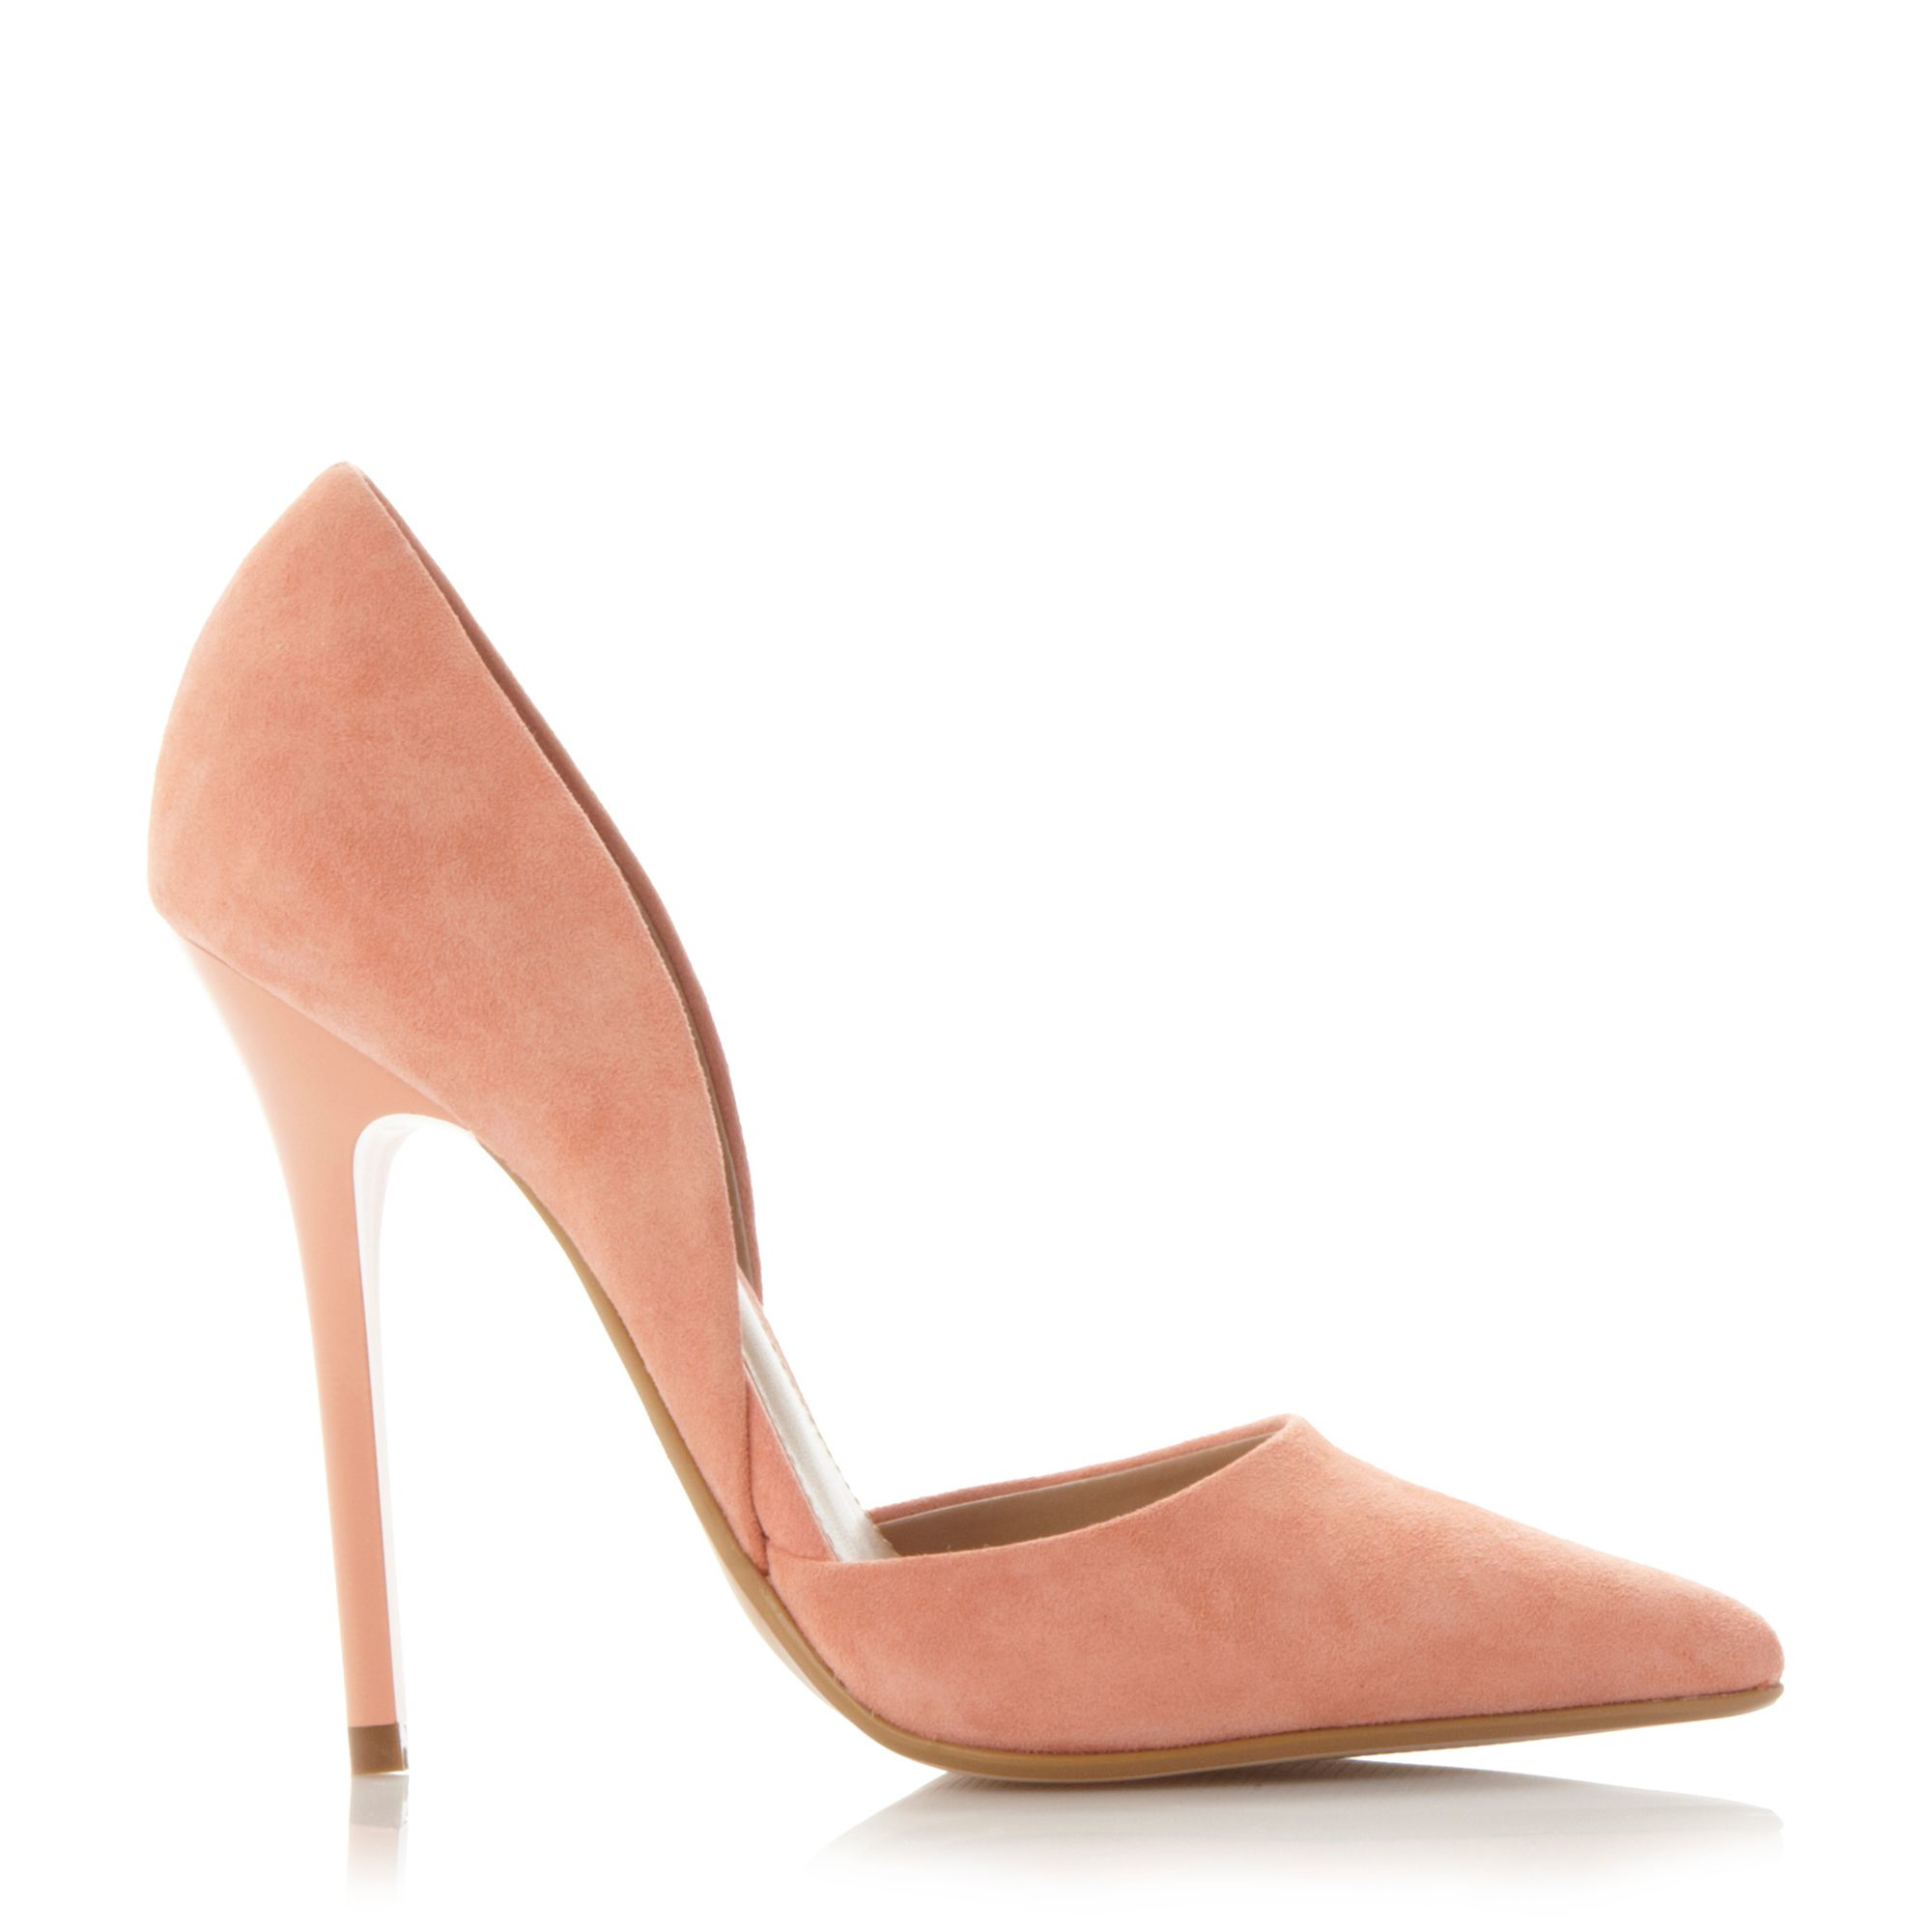 steve madden varcityy pointed court heels in orange lyst. Black Bedroom Furniture Sets. Home Design Ideas